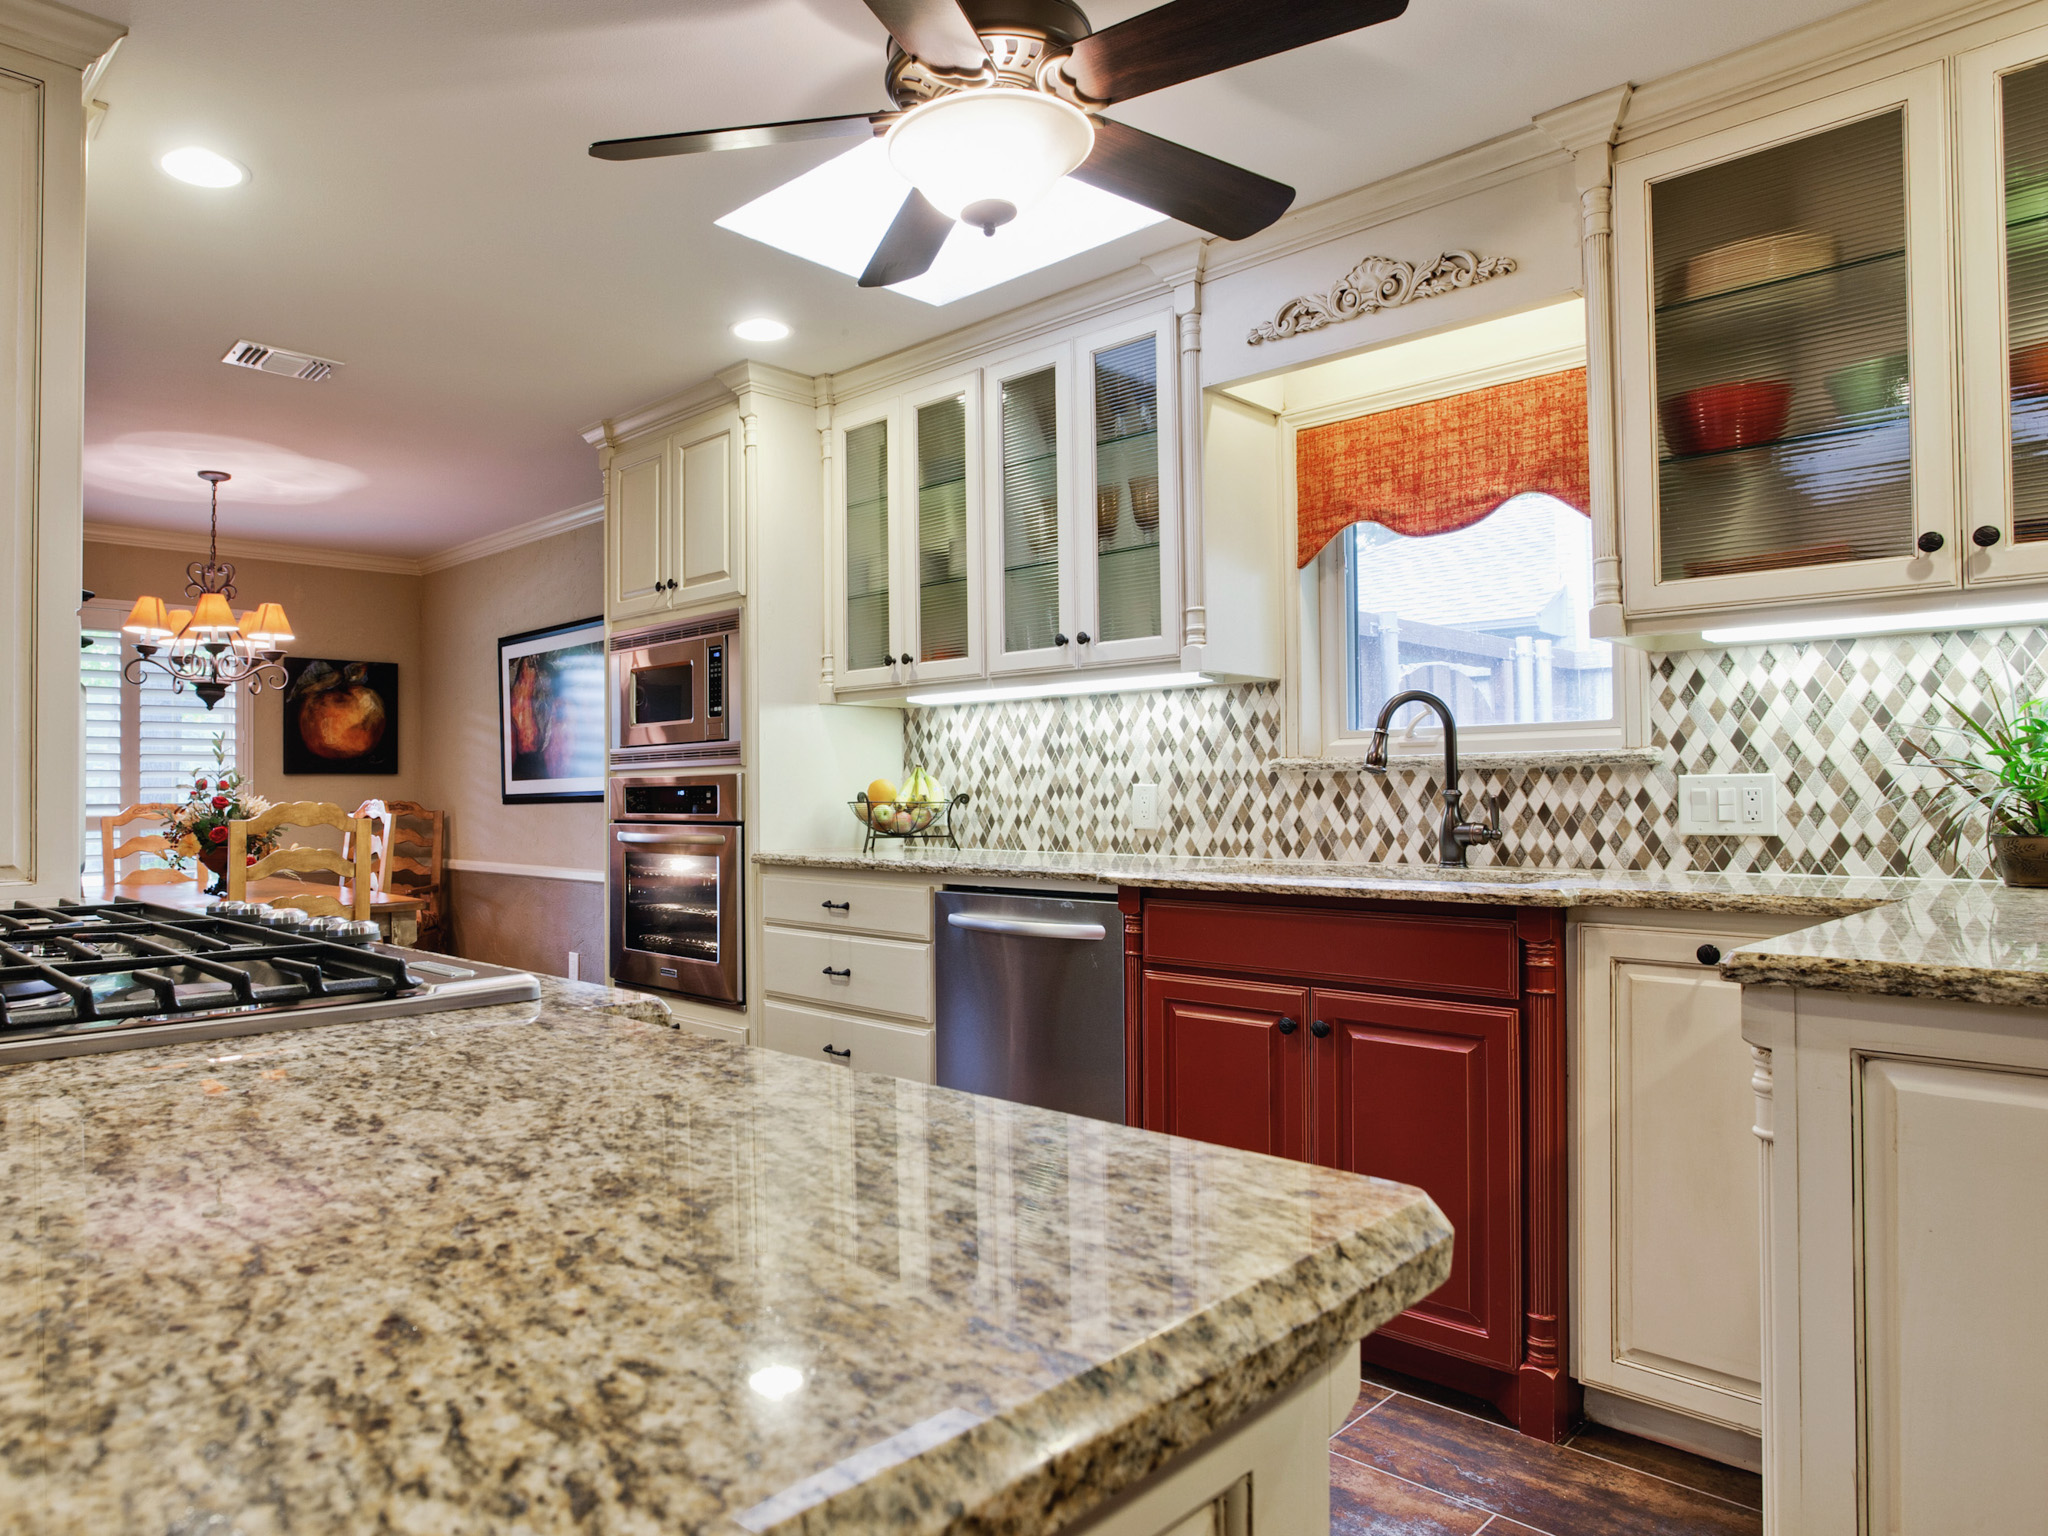 Fine 1 Ceramic Tile Tiny 12X12 Ceramic Tiles Regular 18 X 18 Ceramic Floor Tile 1930S Floor Tiles Old 2 X 8 Glass Subway Tile Yellow24 Ceramic Tile Backsplash Ideas For Granite Countertops   HGTV Pictures | HGTV